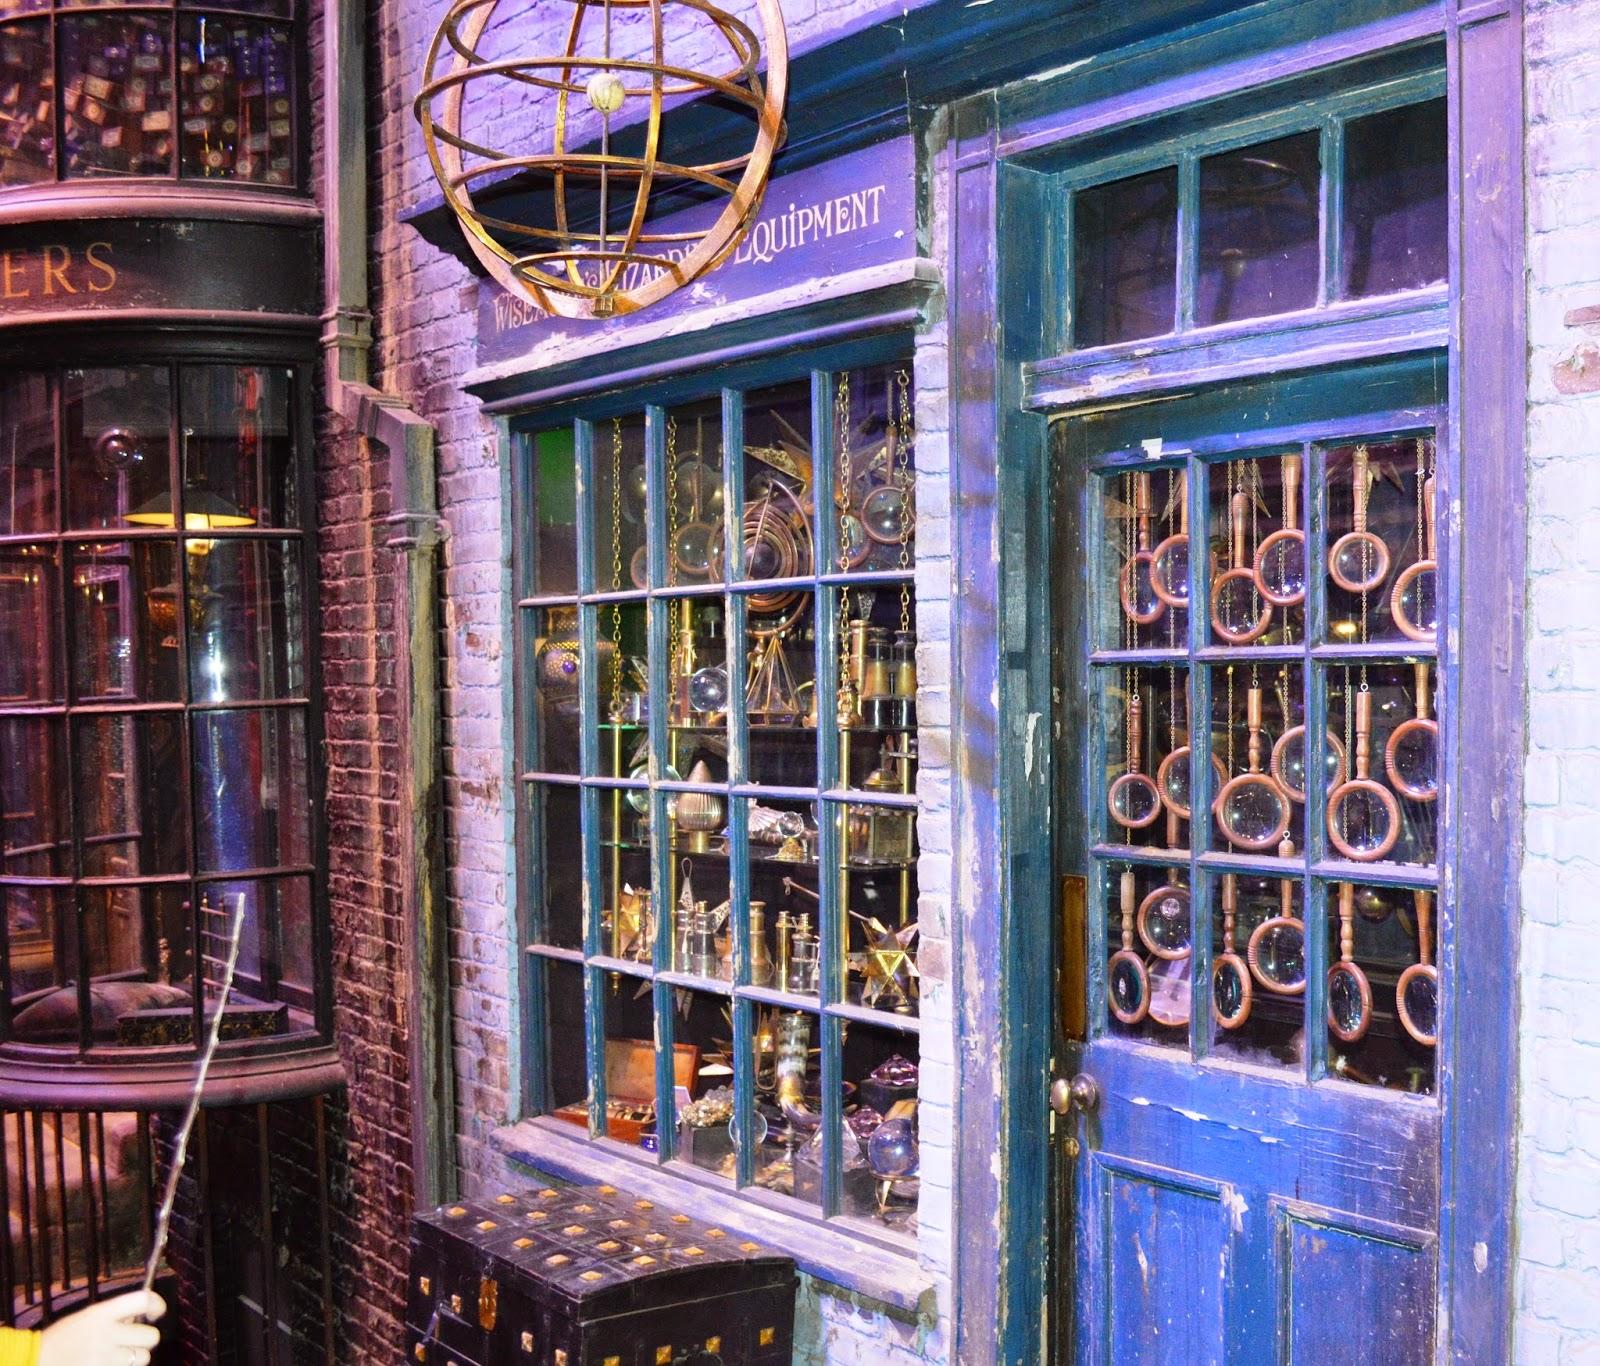 Harry Potter, Warner Brothers Studio Tour, Diagon alley, shop fronts, photographs